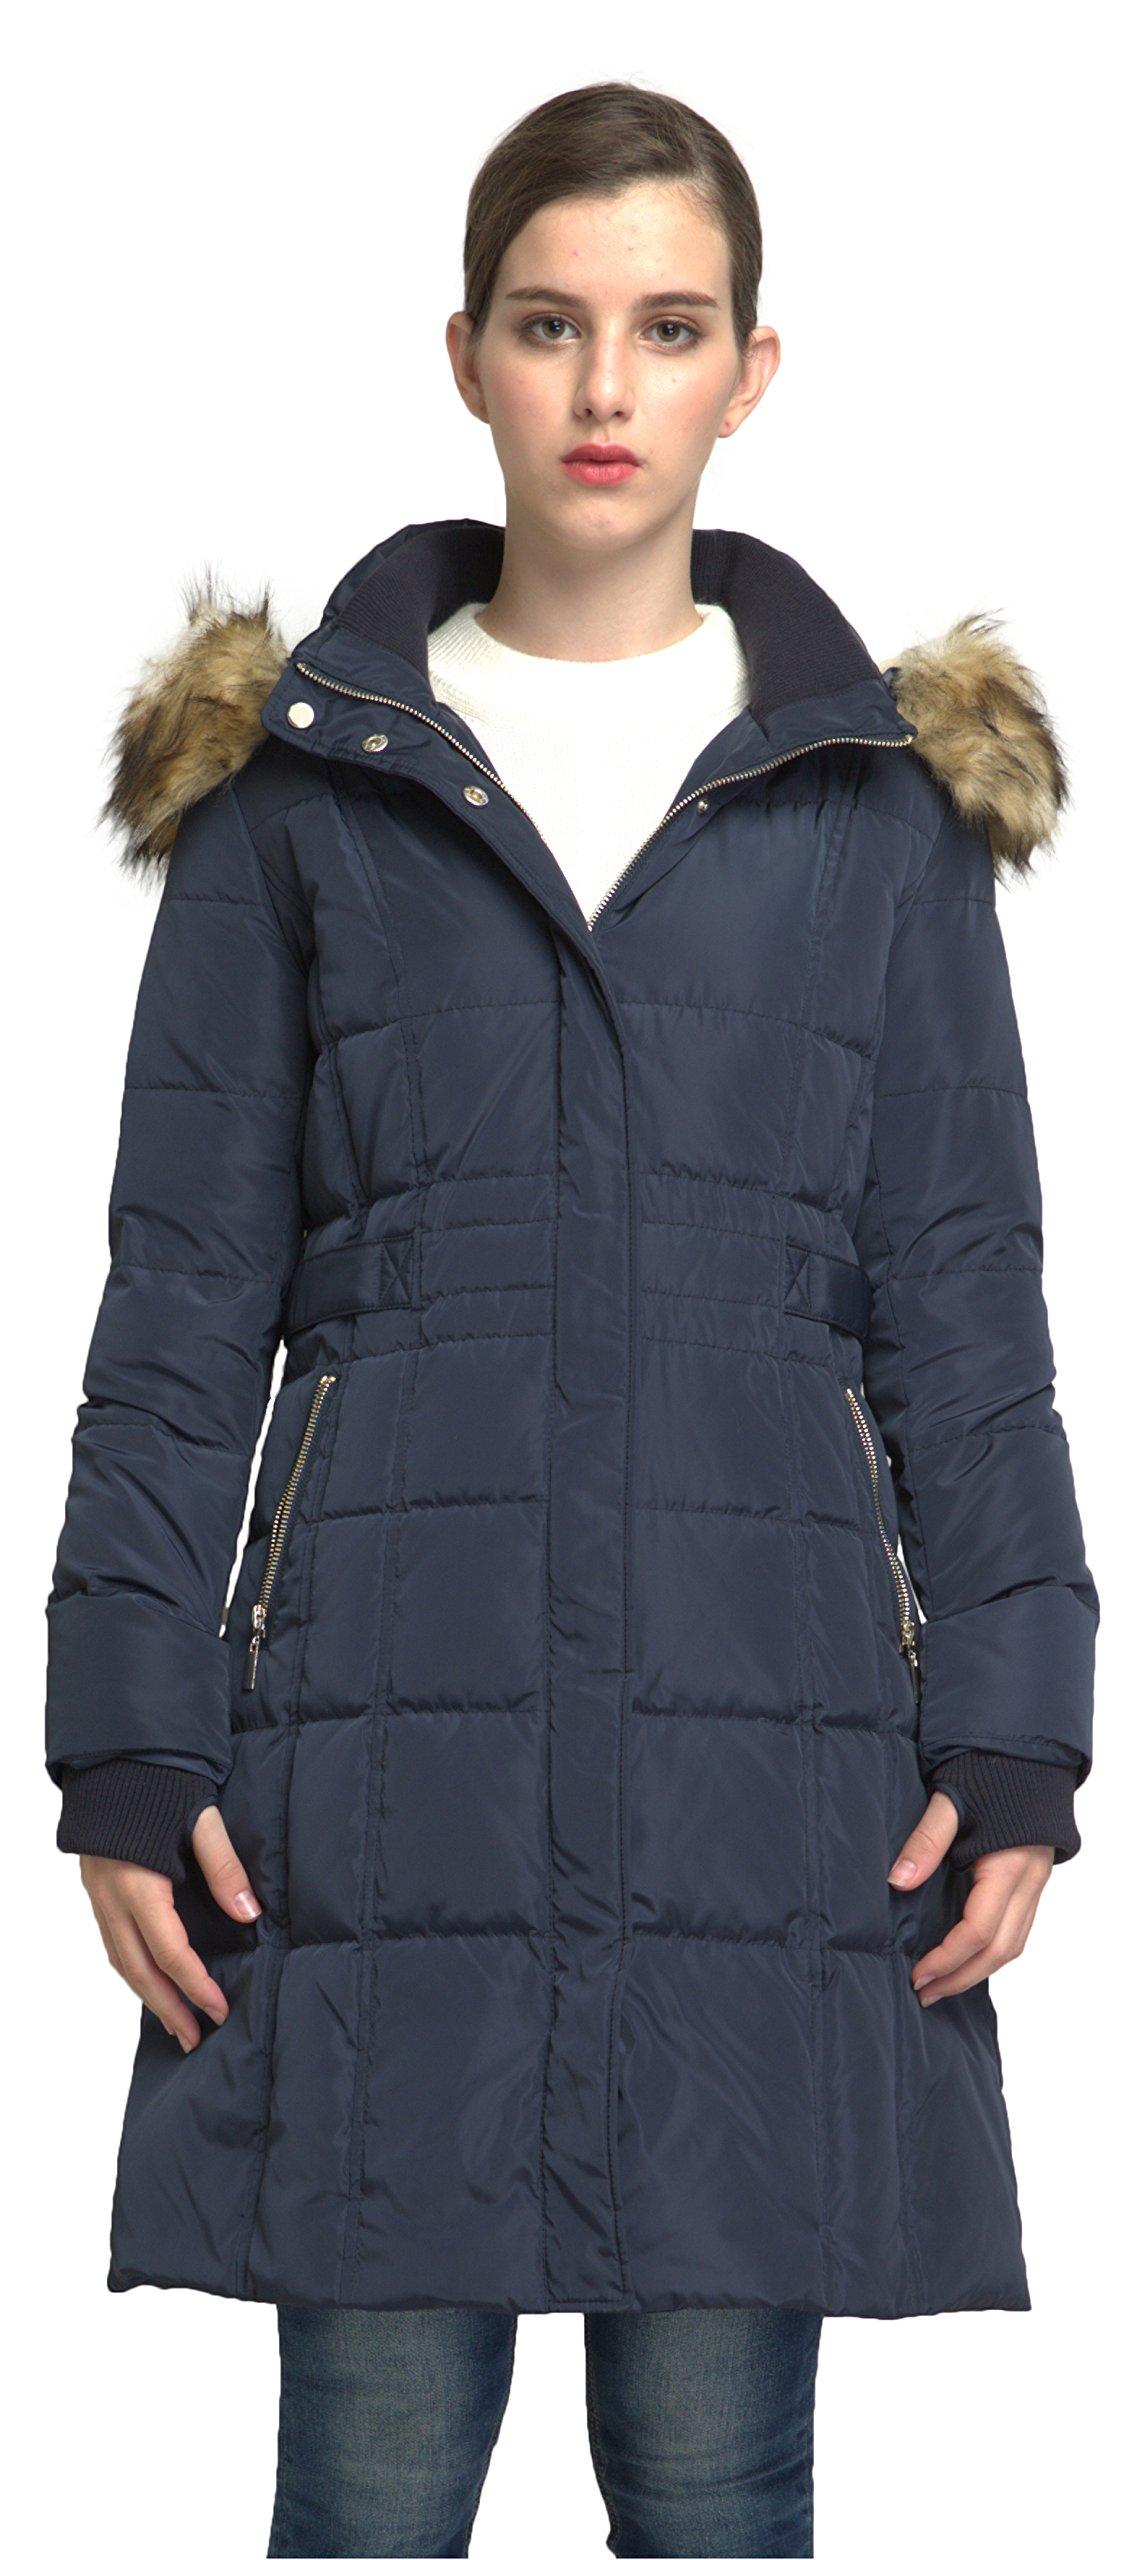 Orolay Women's Puffer Down Coat Winter Jacket with Faux Fur Trim Hood YRF8020Q Navy XL